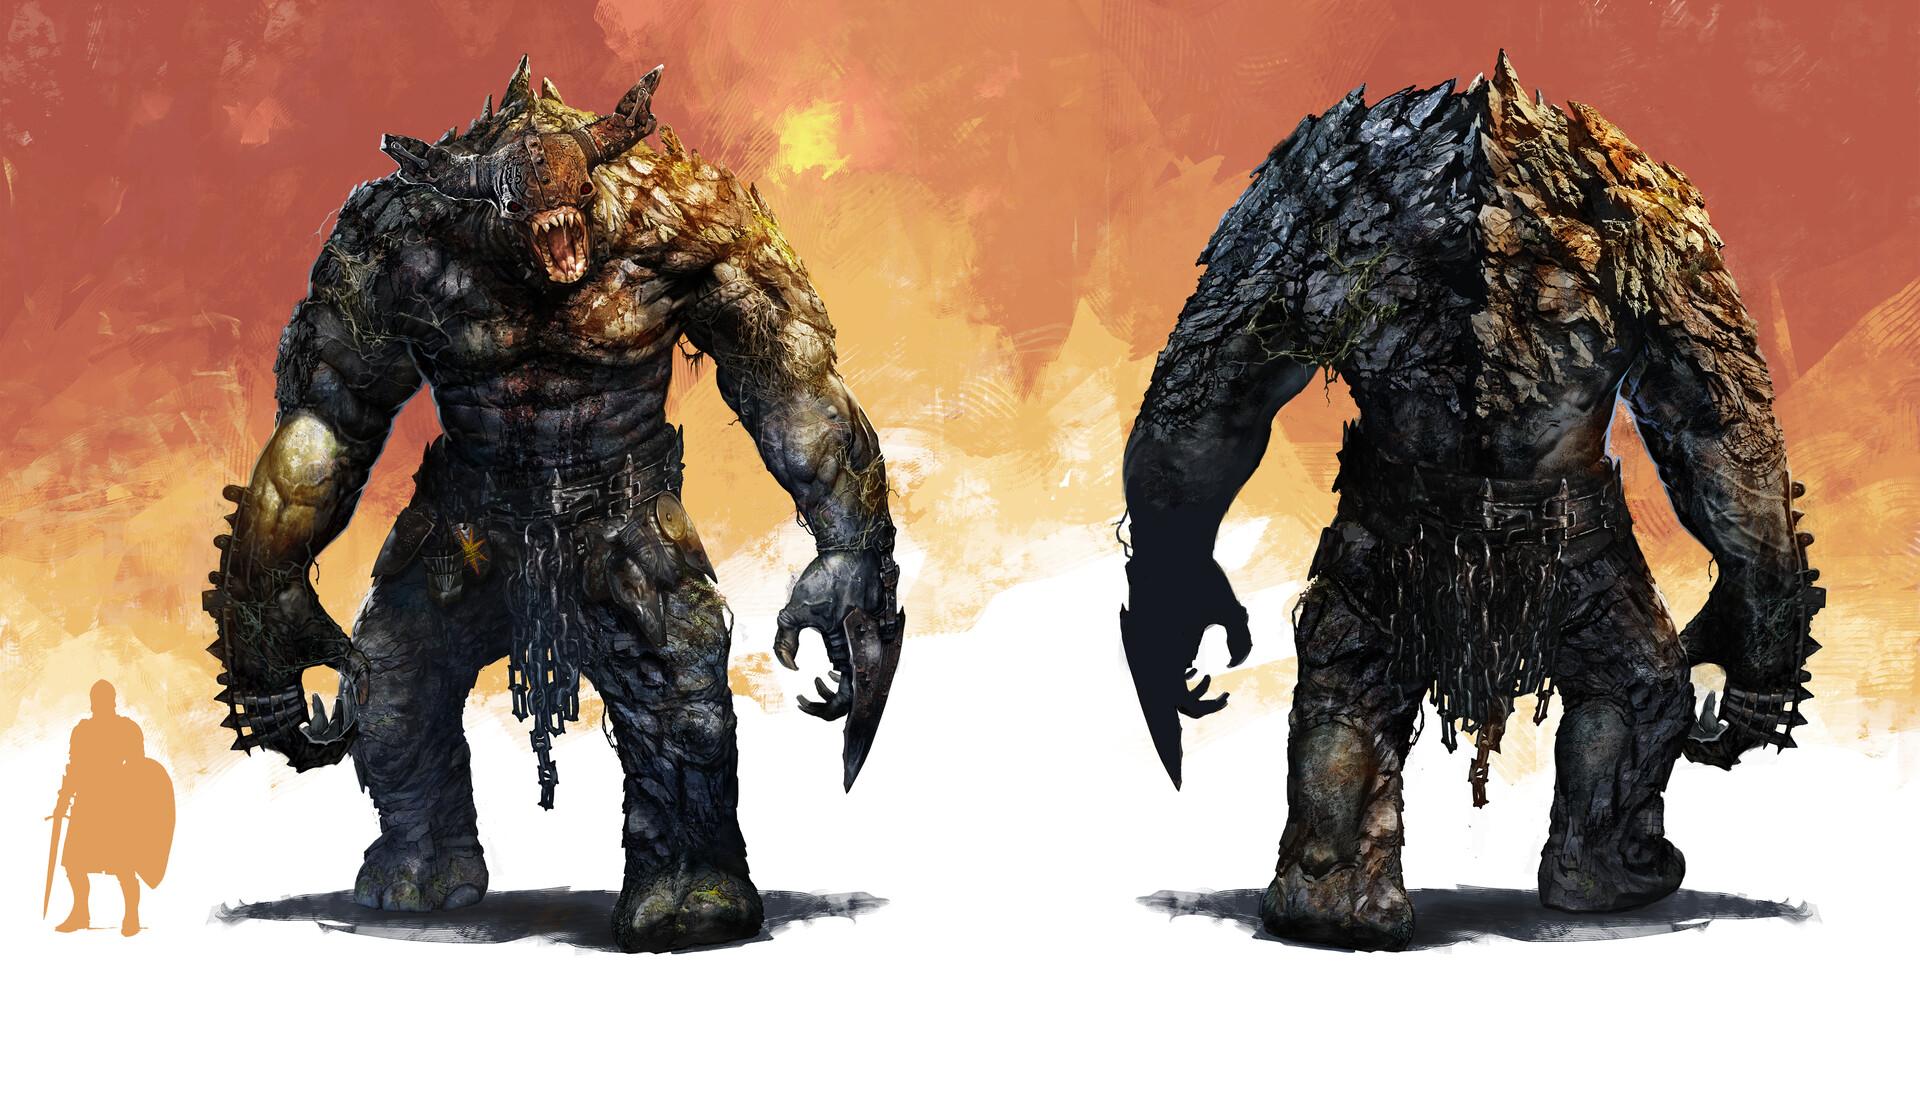 Jakub kuzma stone troll 1s